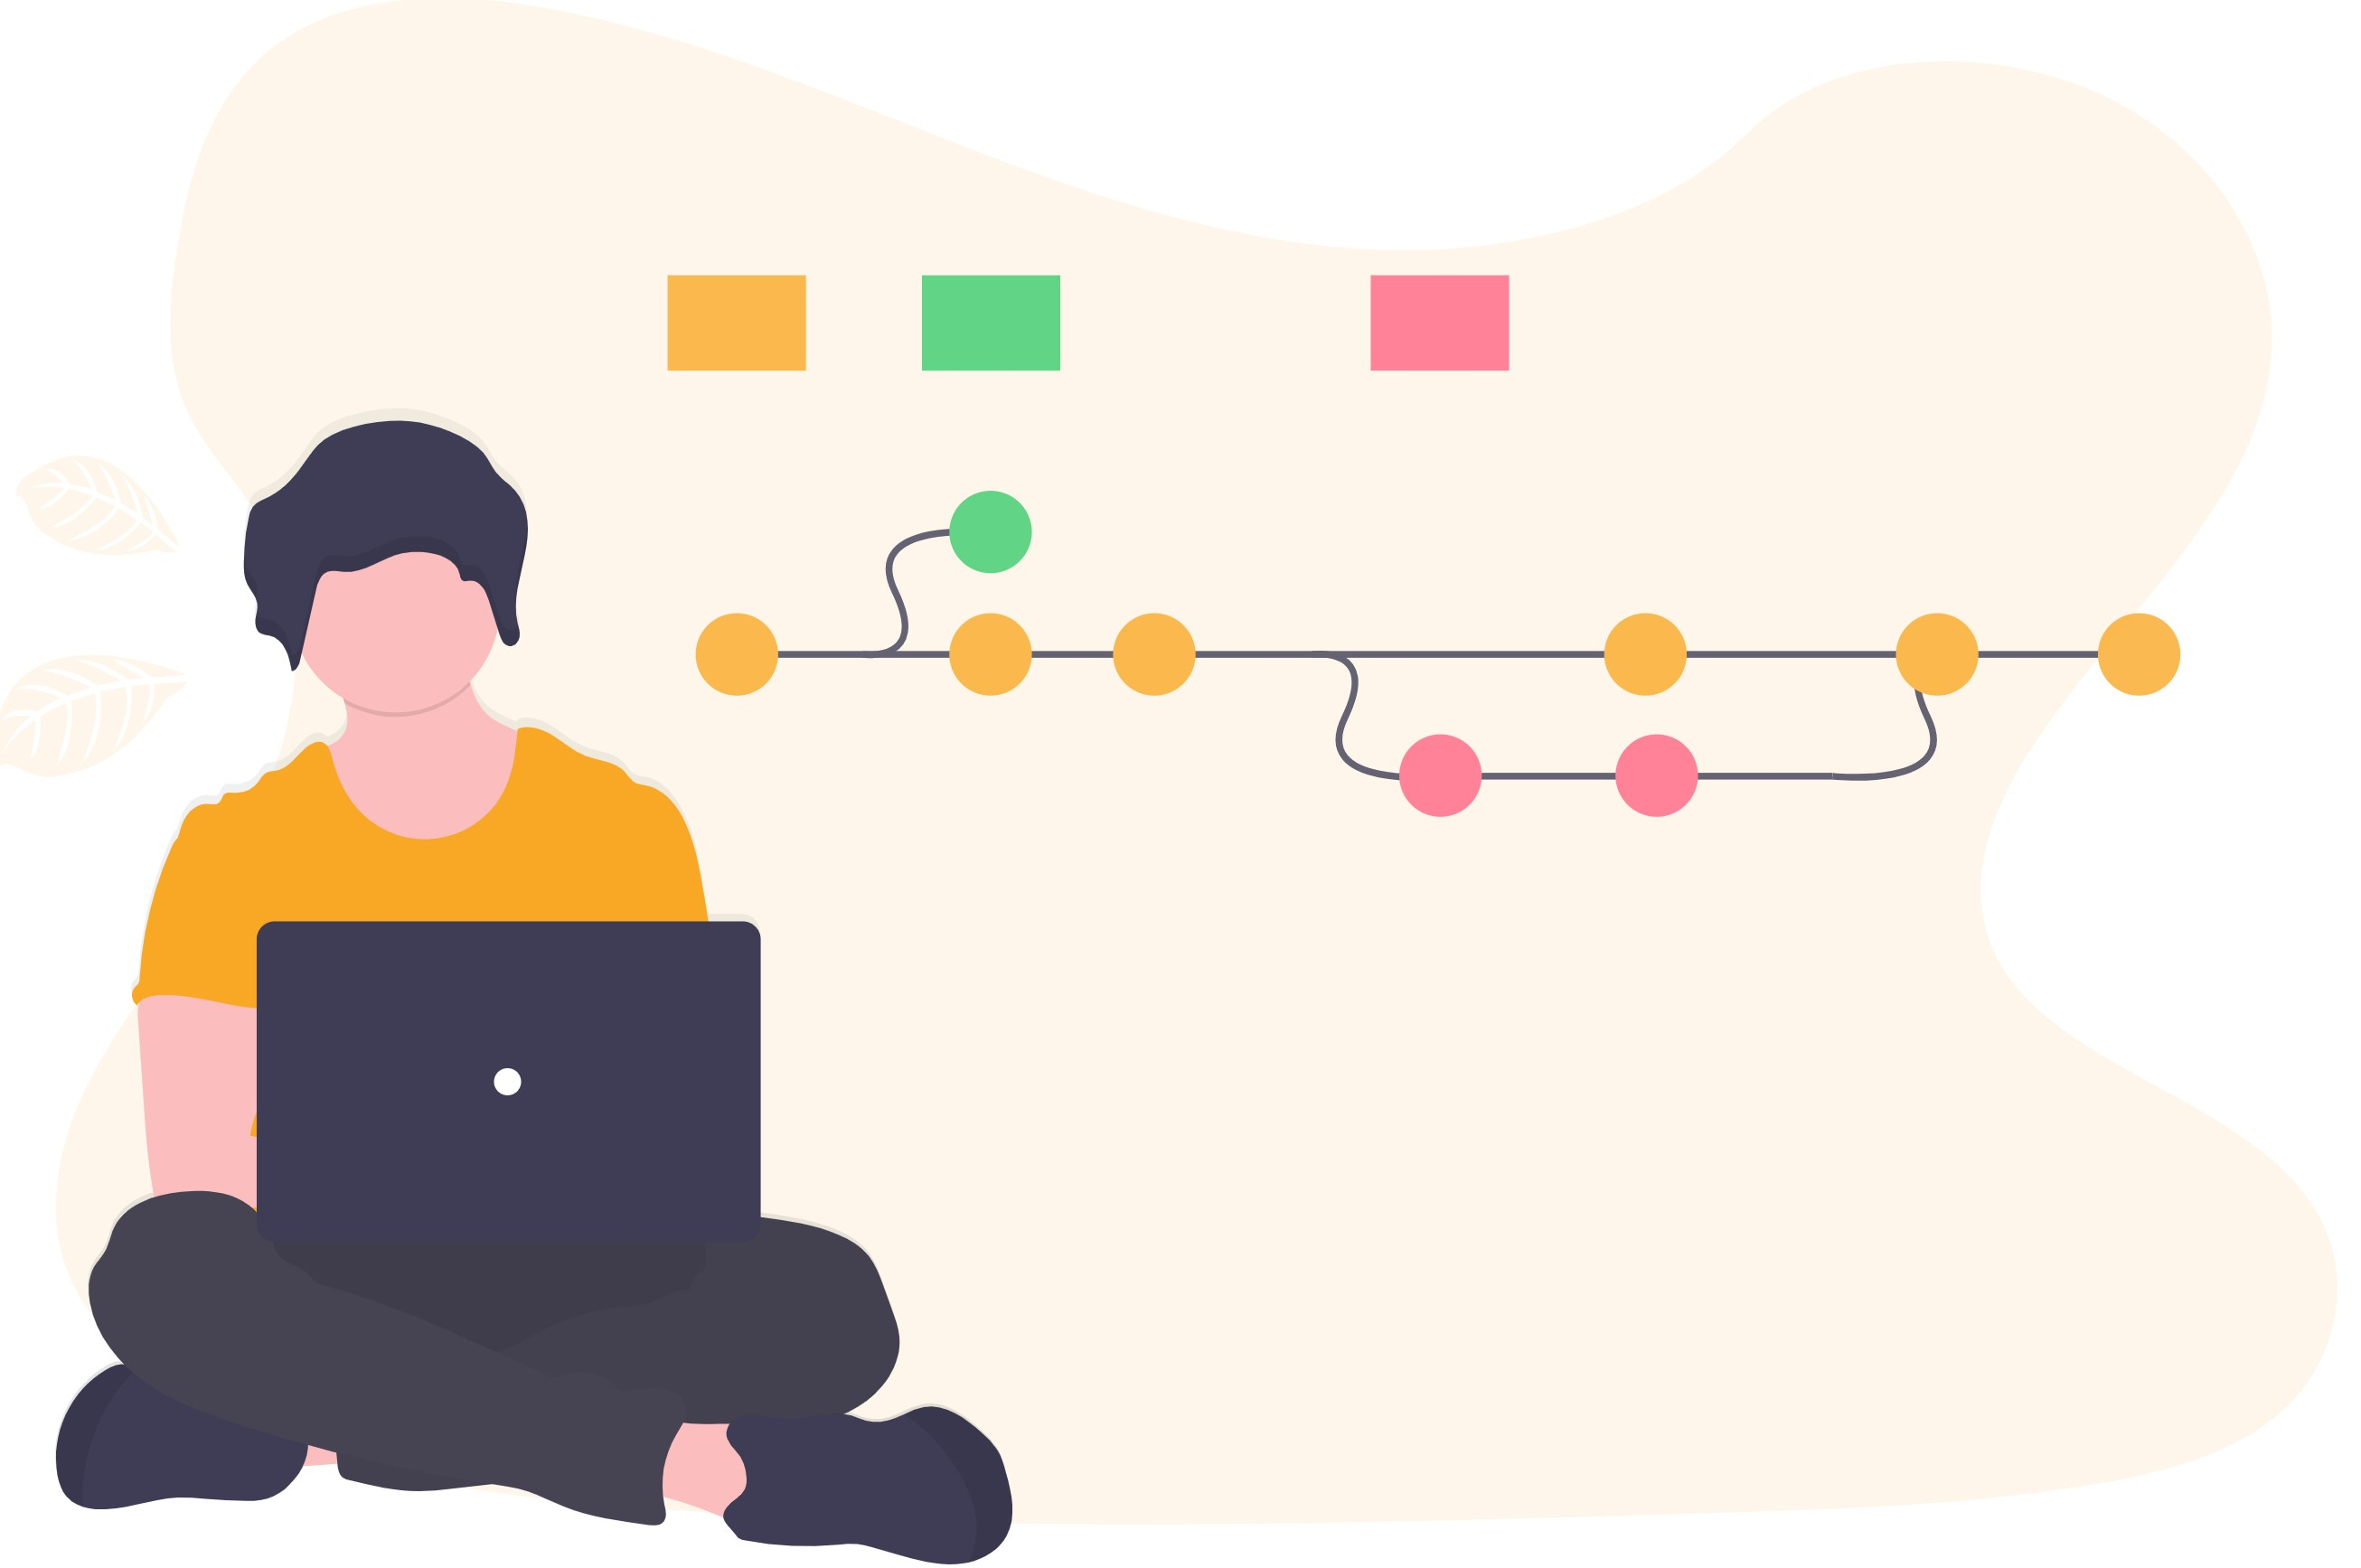 Optimizing model performance